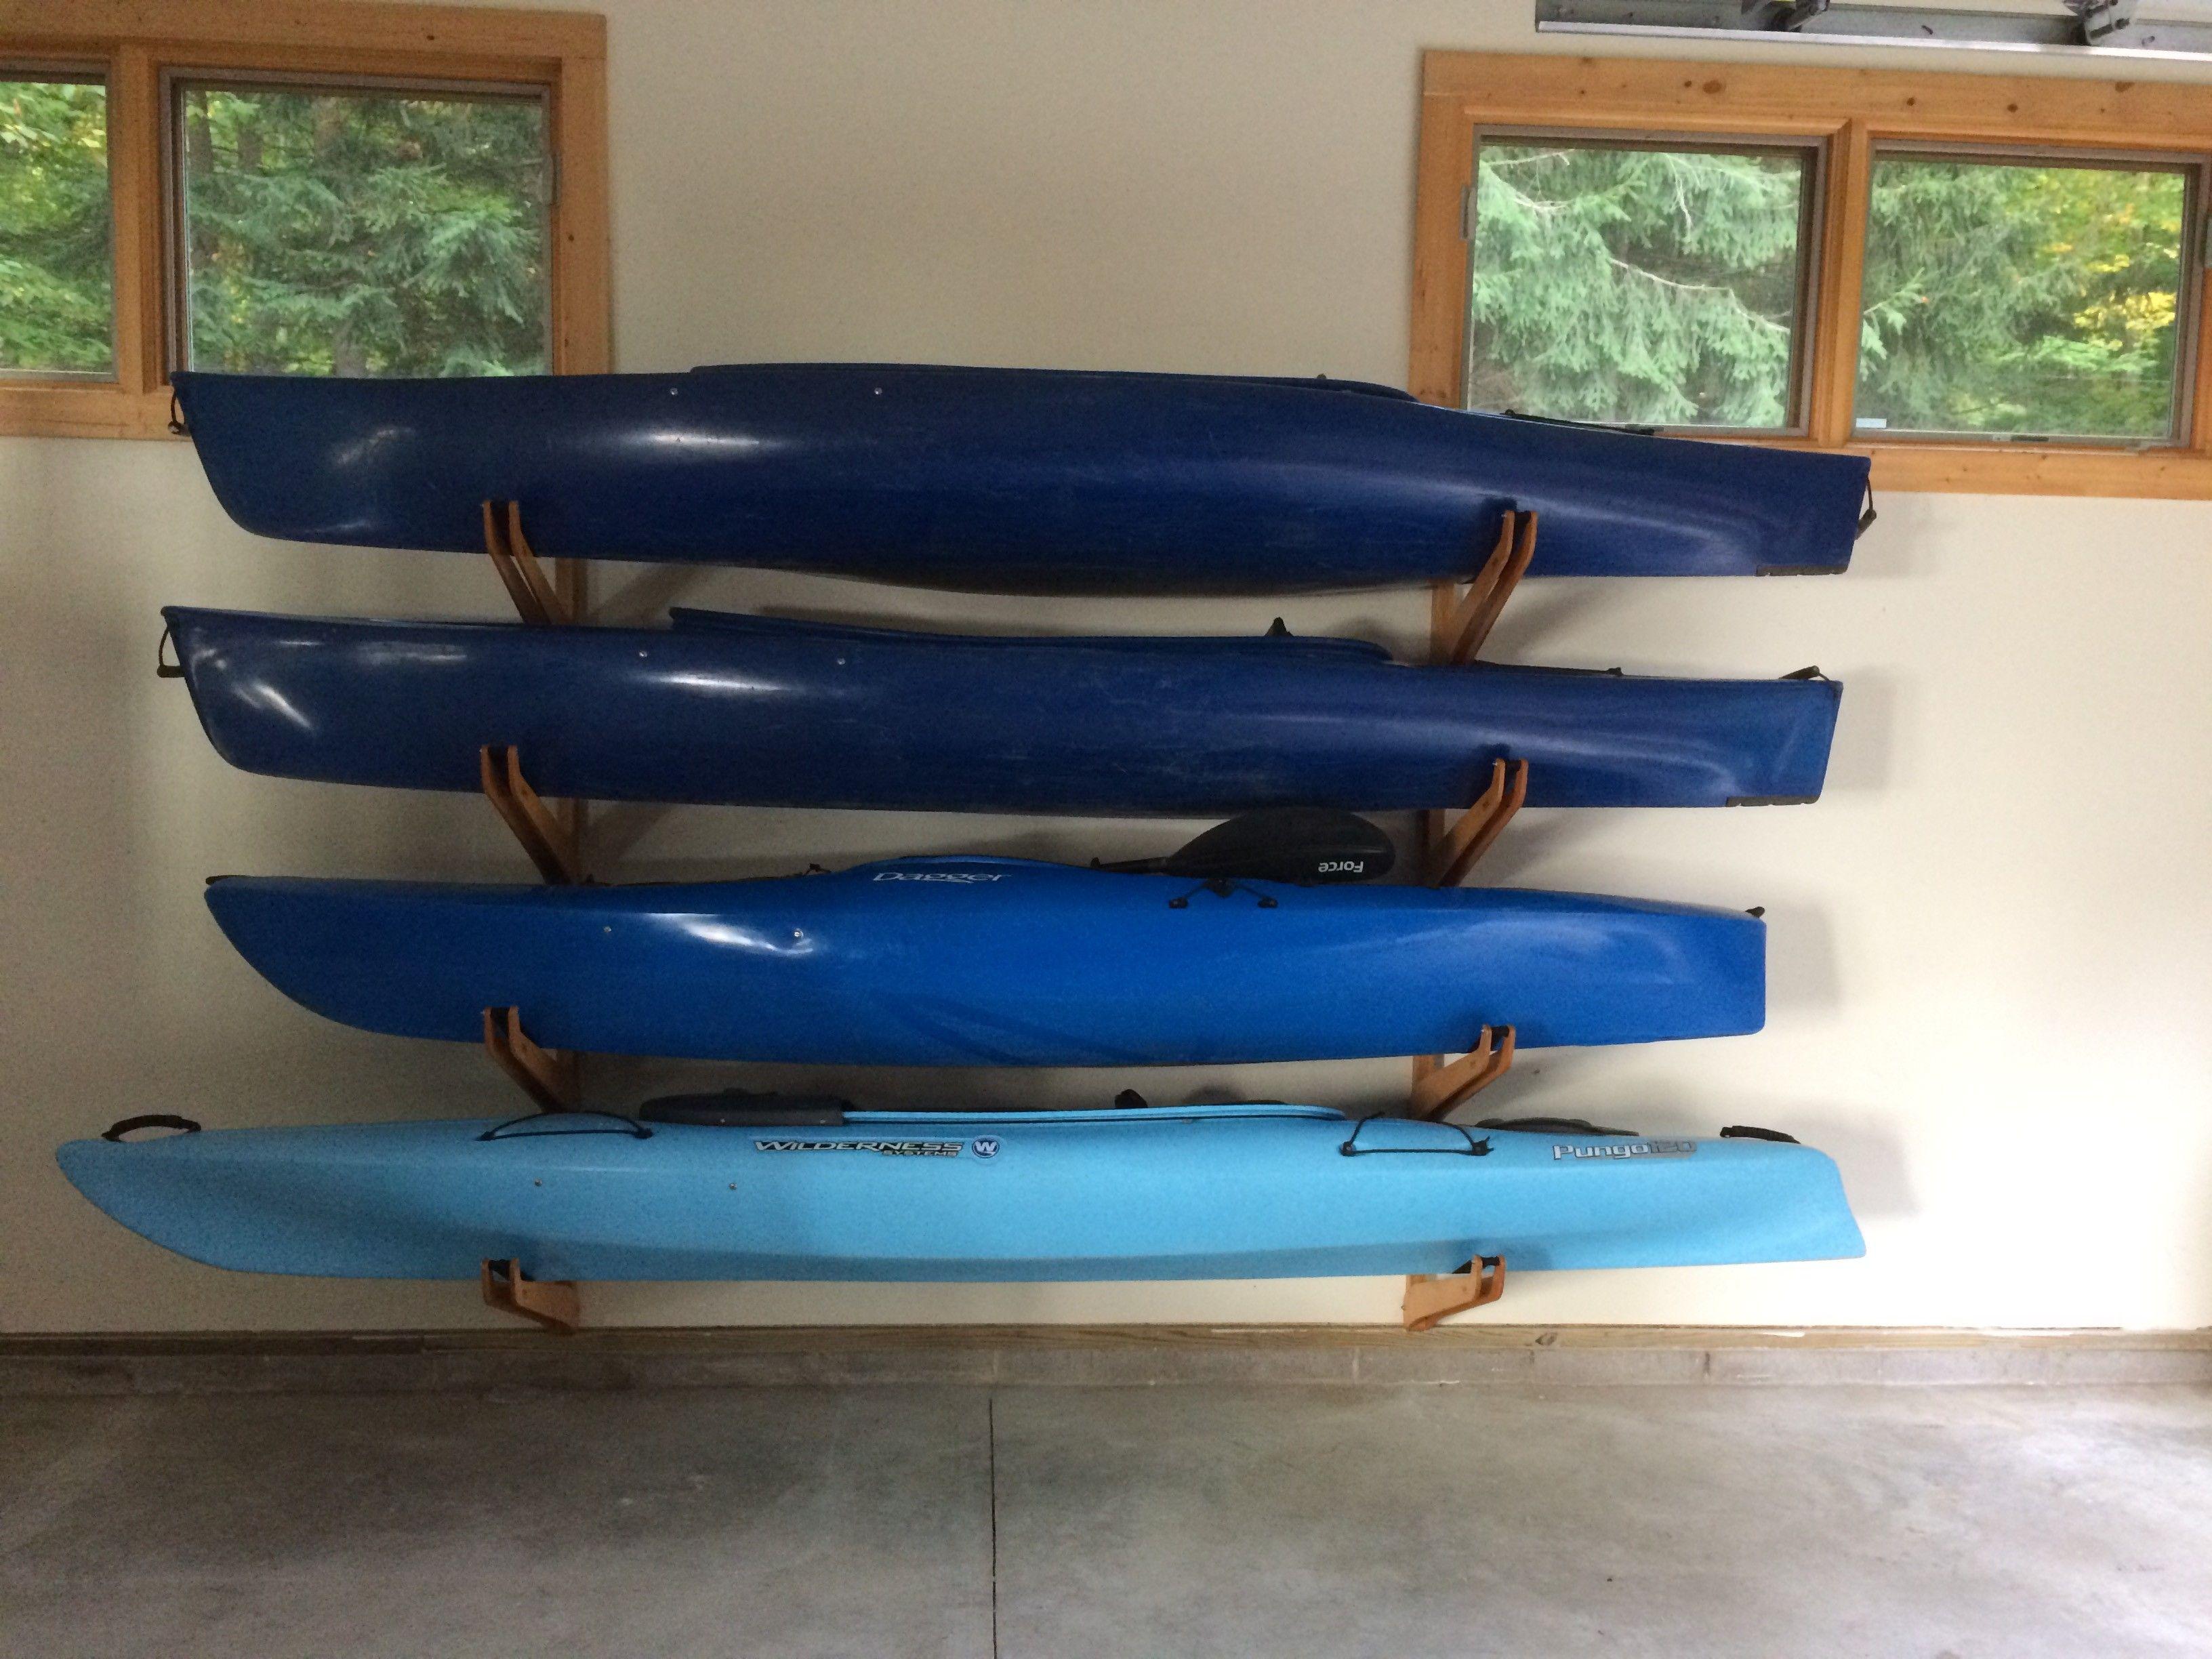 Beautiful wooden kayak racks looks great while storing